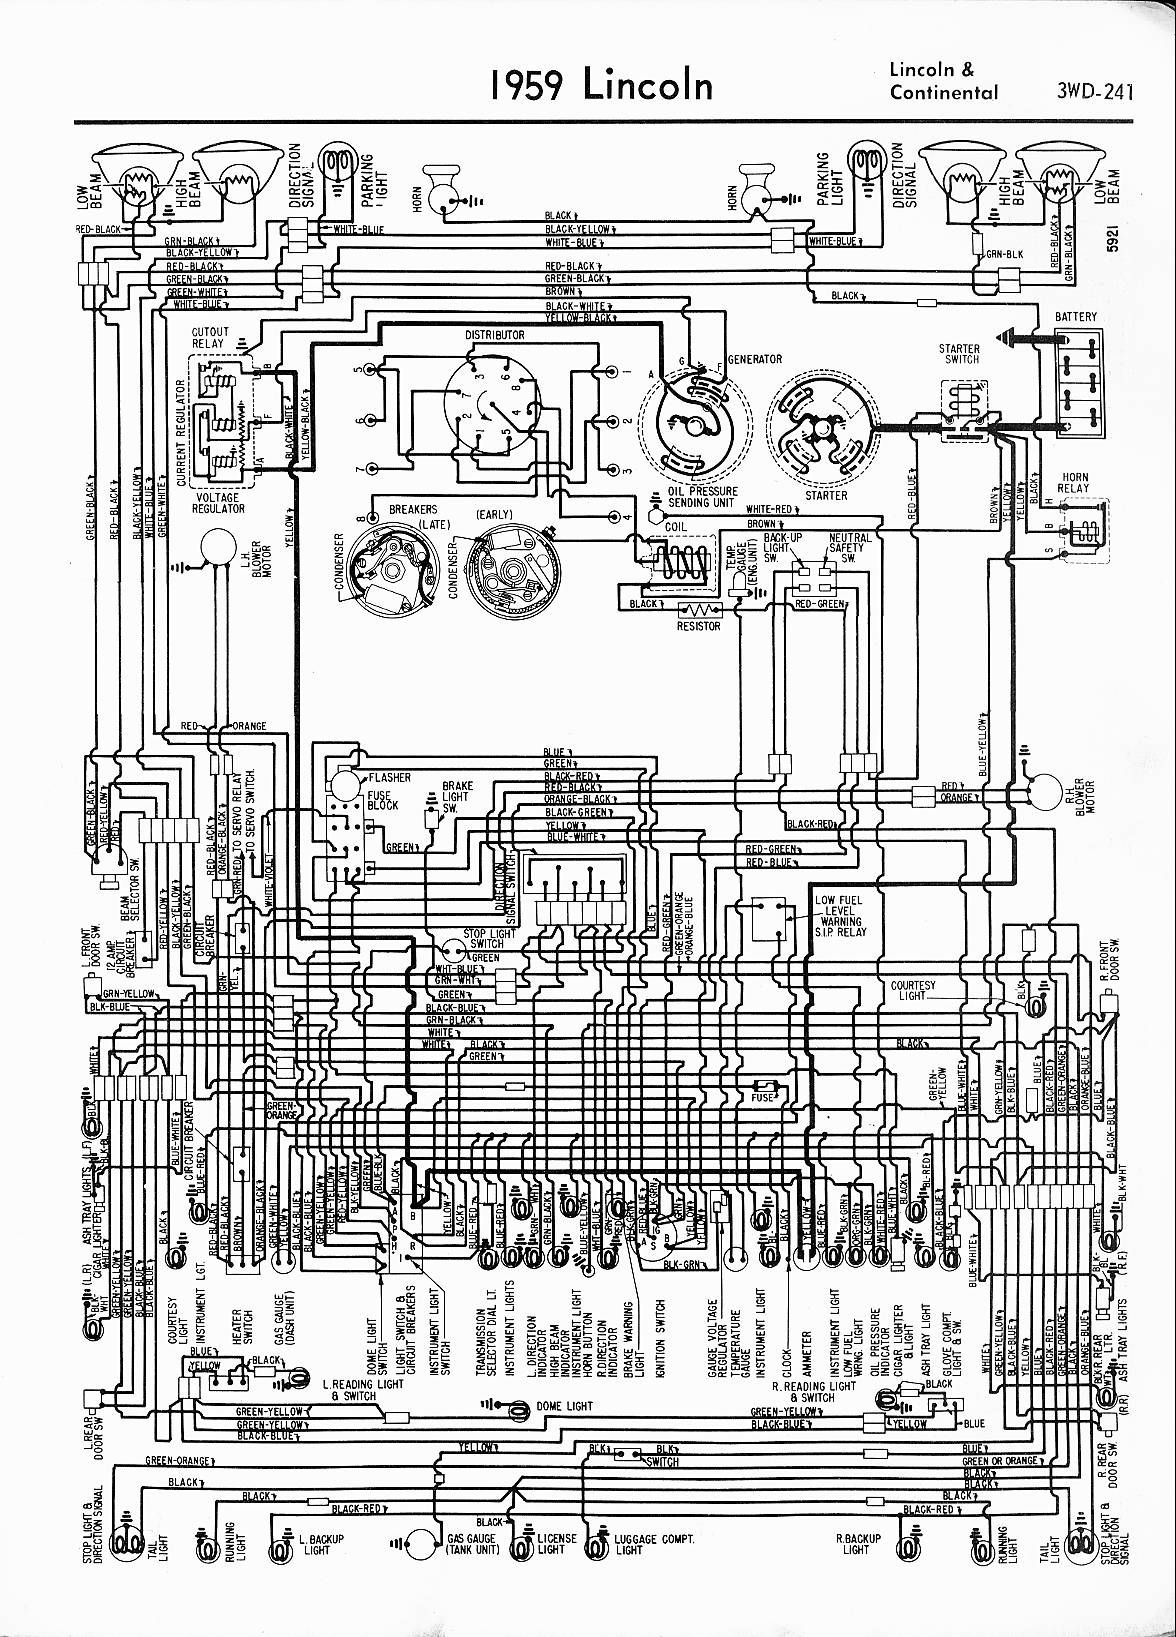 kinetic honda wiring diagram wiring diagram diagram wire verucci wiring diagram kinetic honda wiring diagram [ 1176 x 1637 Pixel ]